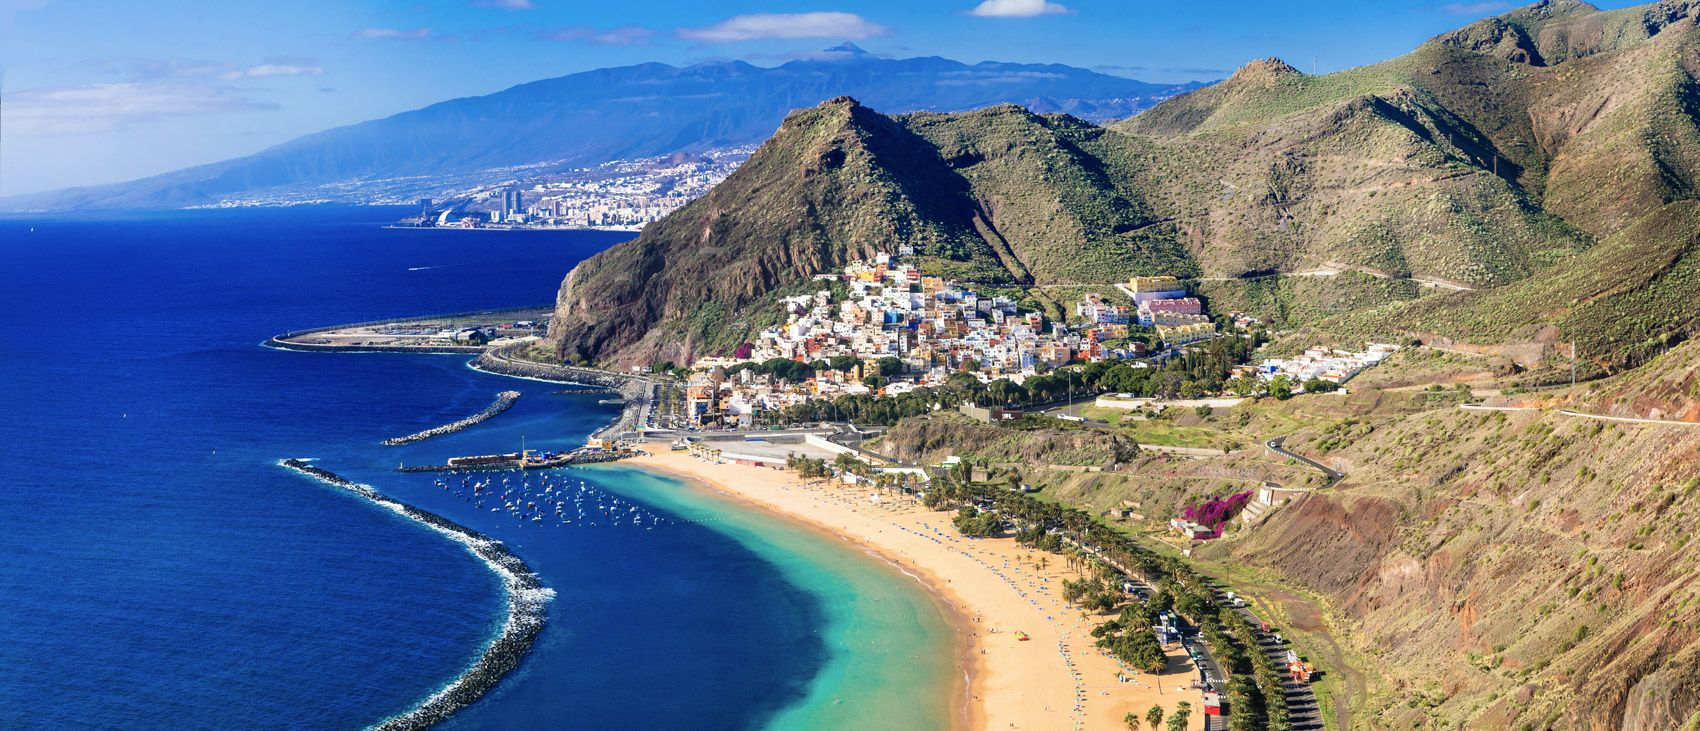 Top 5 Surf Spots In Tenerife Beautiful Places In Spain Tenerife